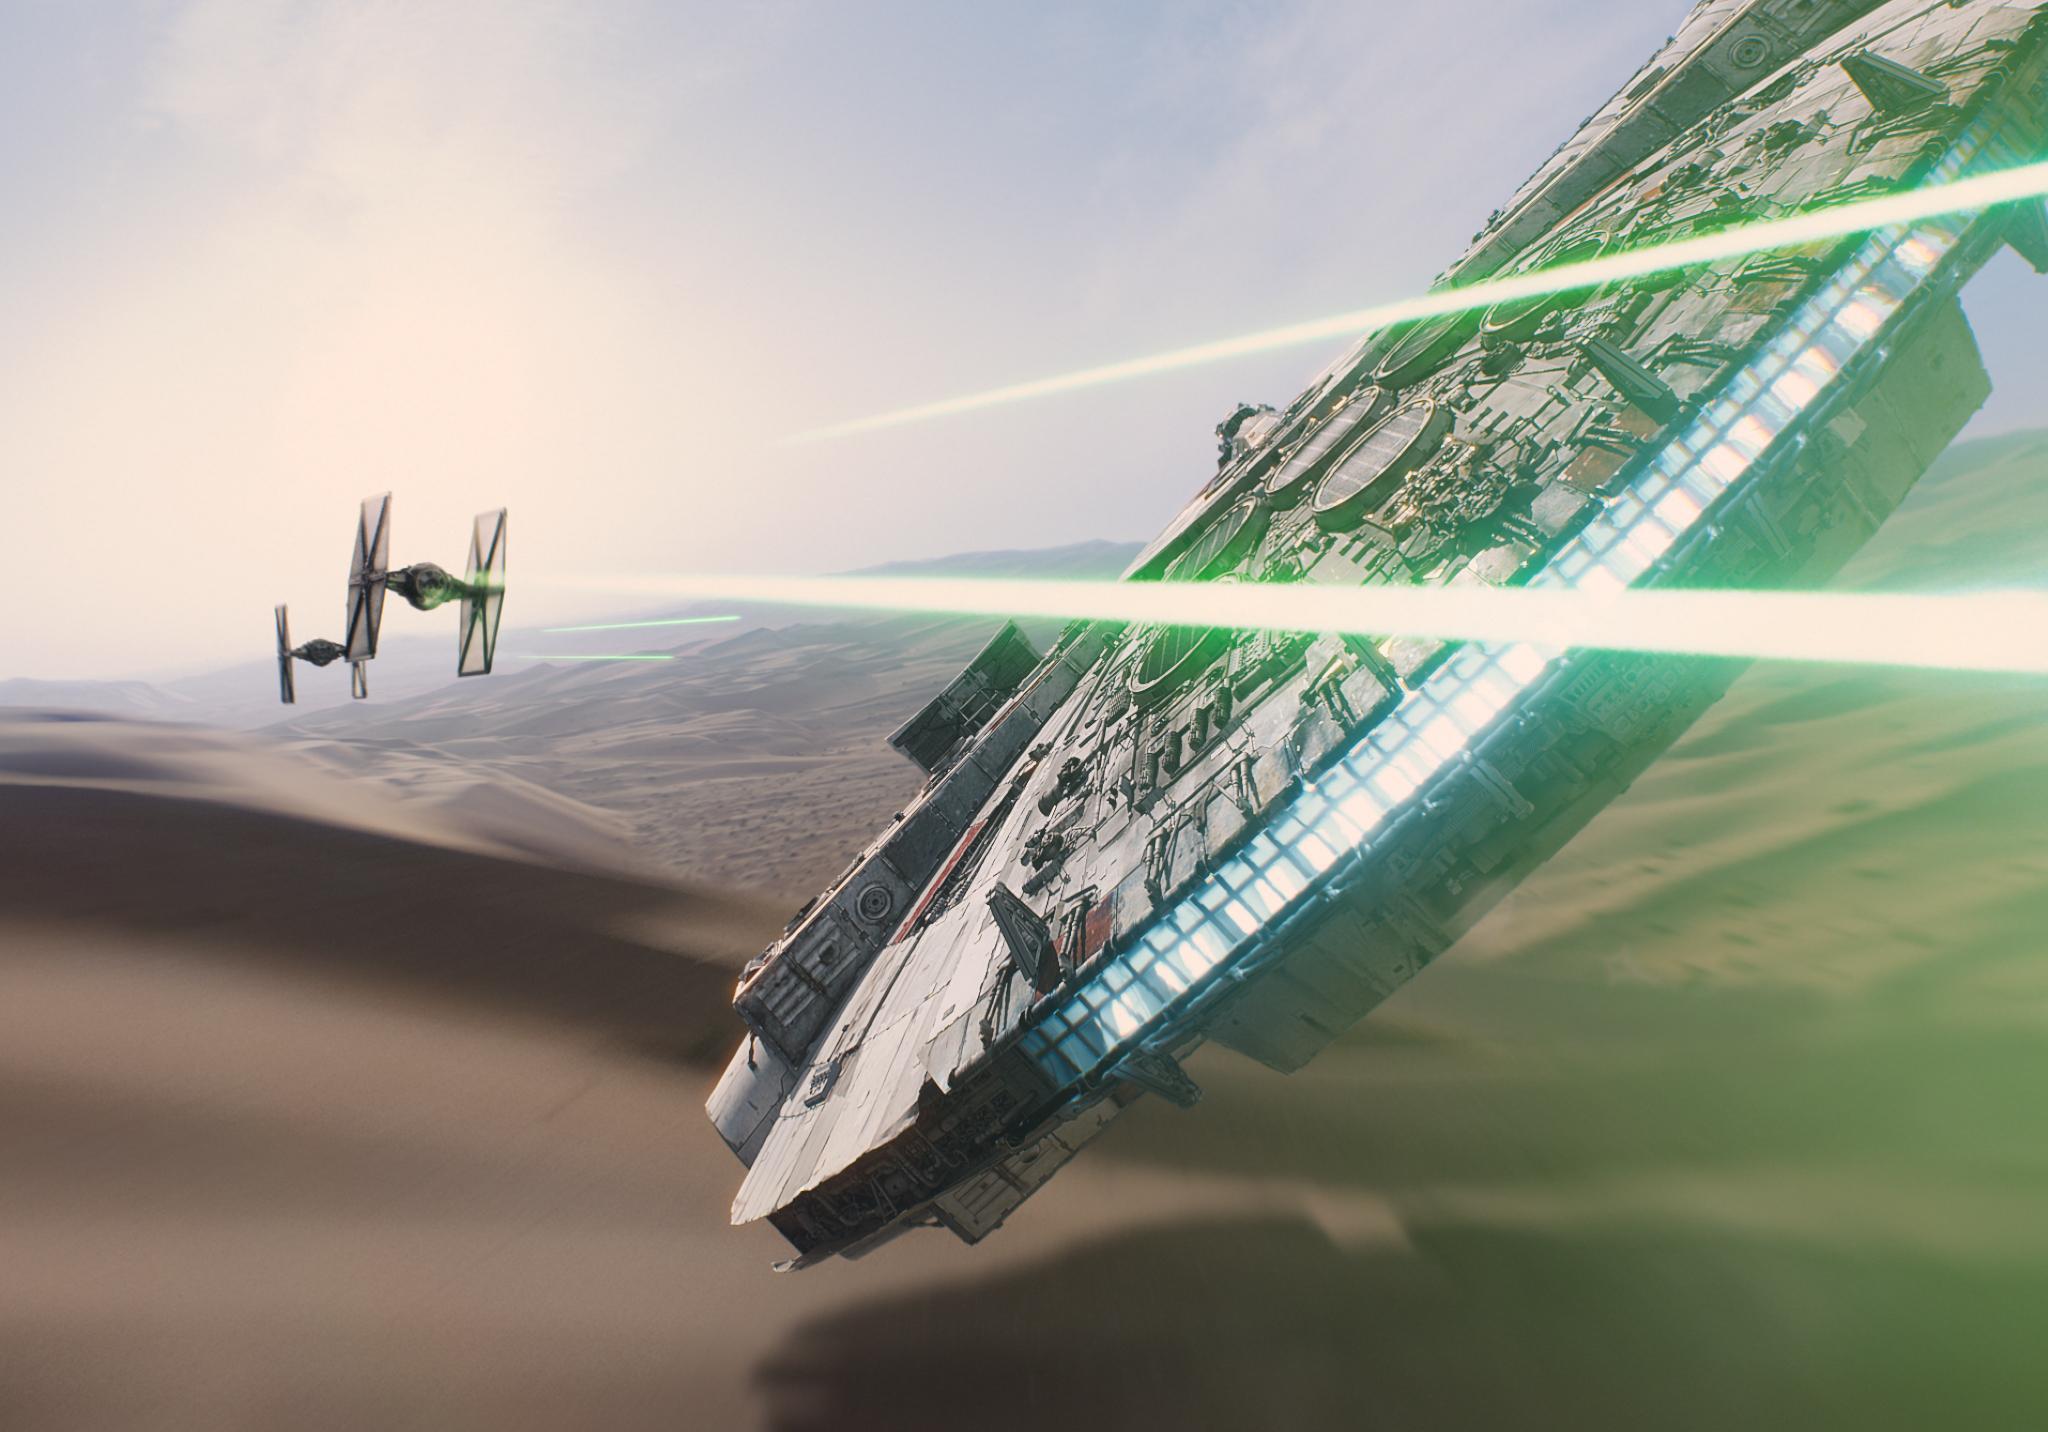 star-wars-the-force-awakens-millennium-falcon (1)